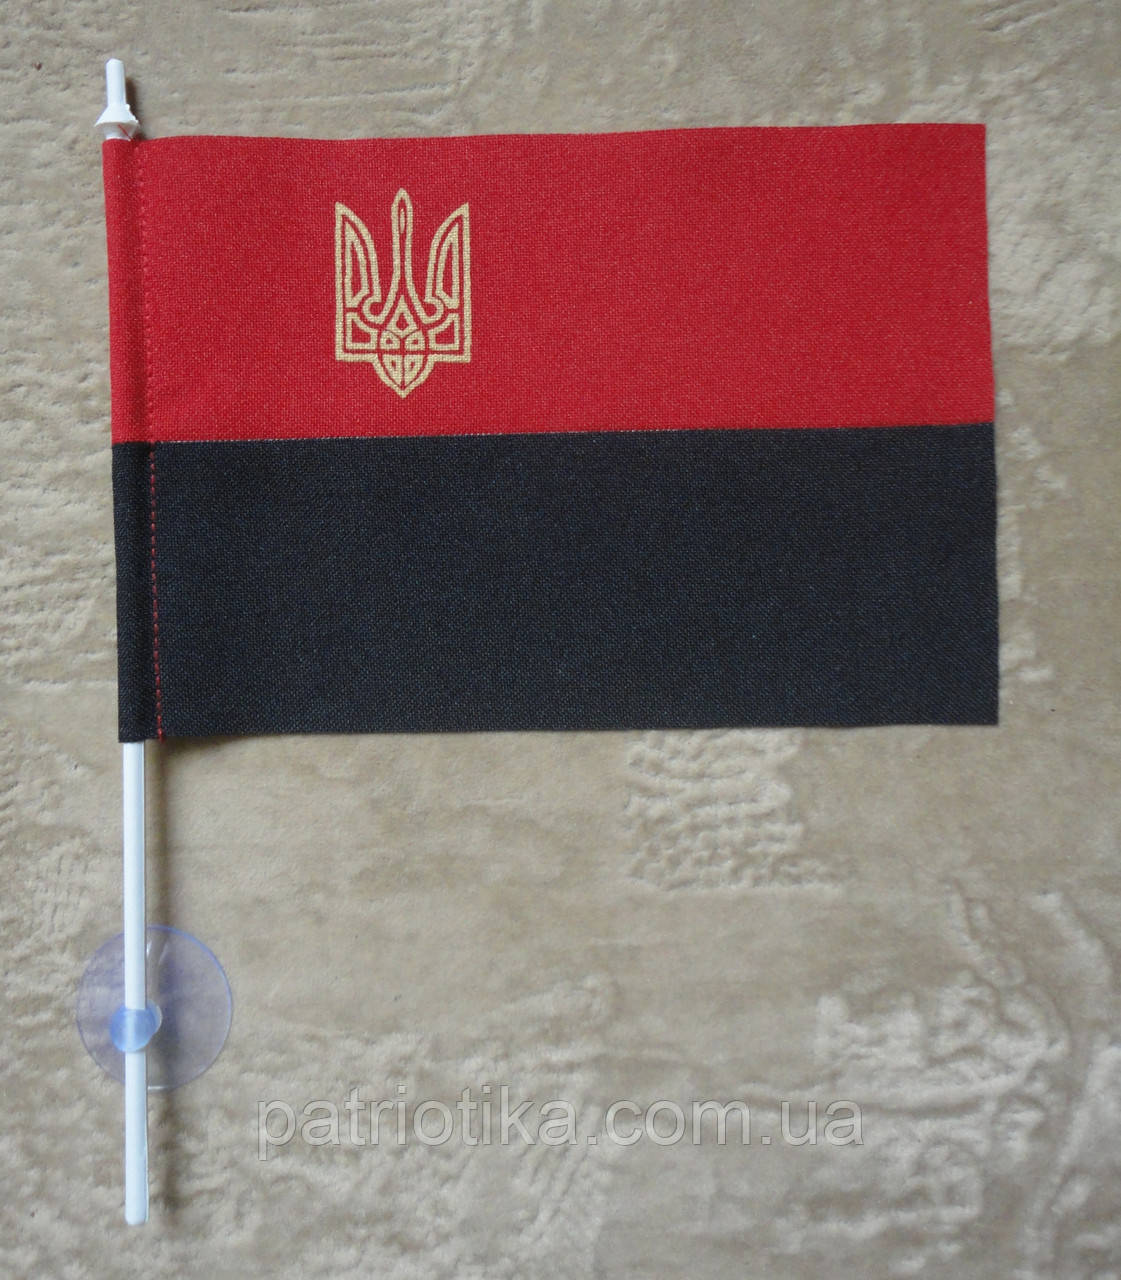 Флажок УПА | Прапорець УПА 10х15 см полиэстер